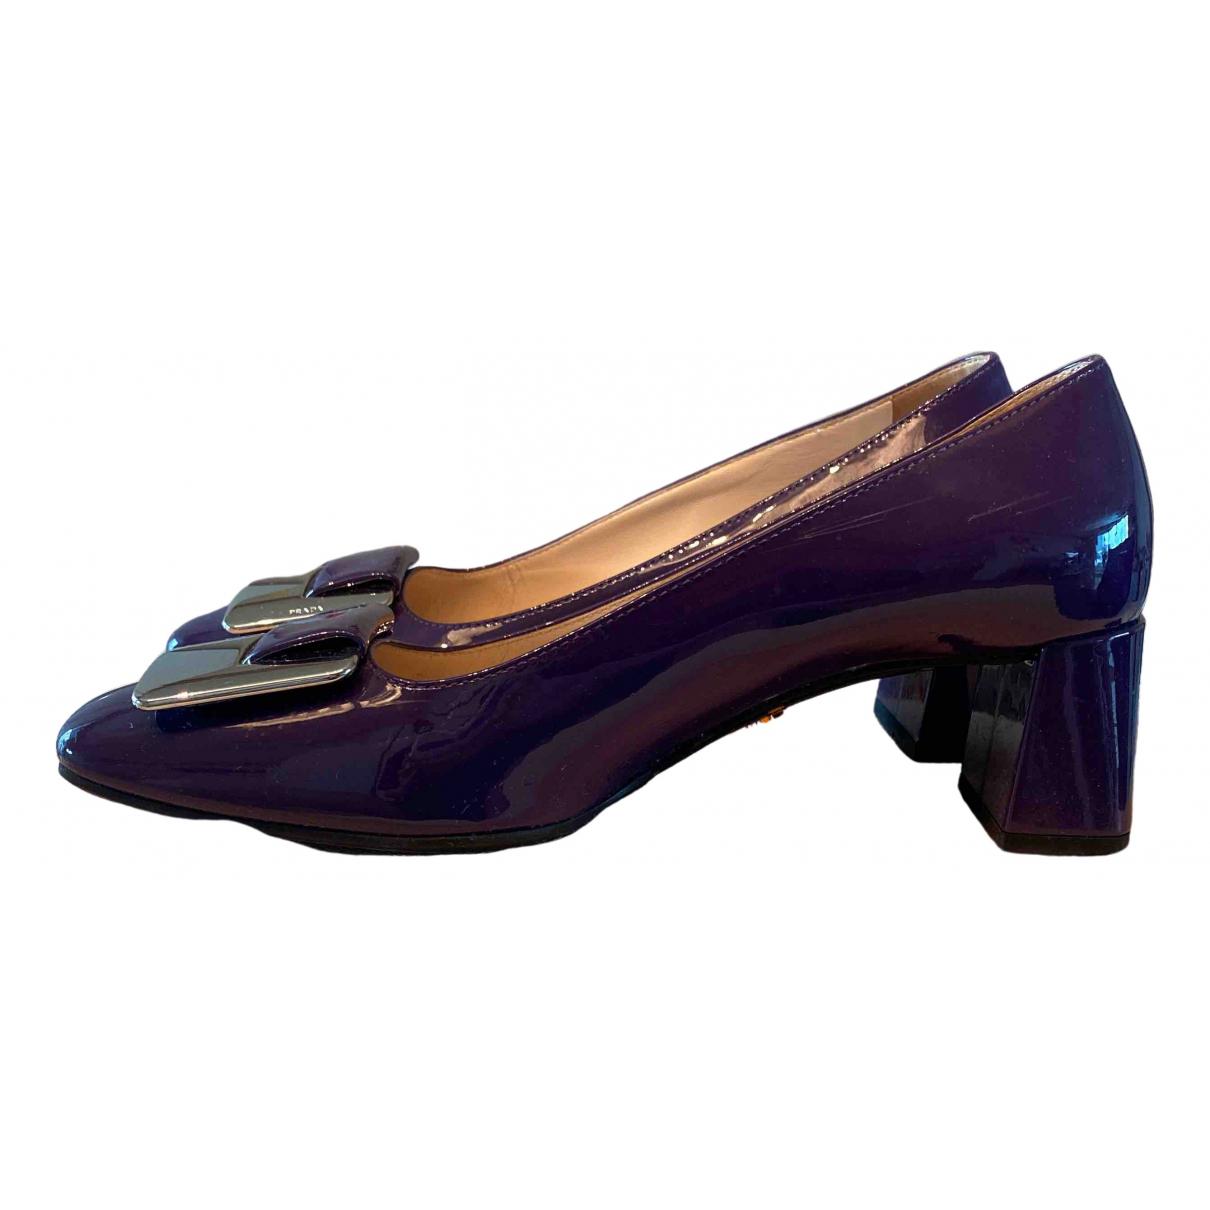 Prada \N Purple Patent leather Heels for Women 35 EU